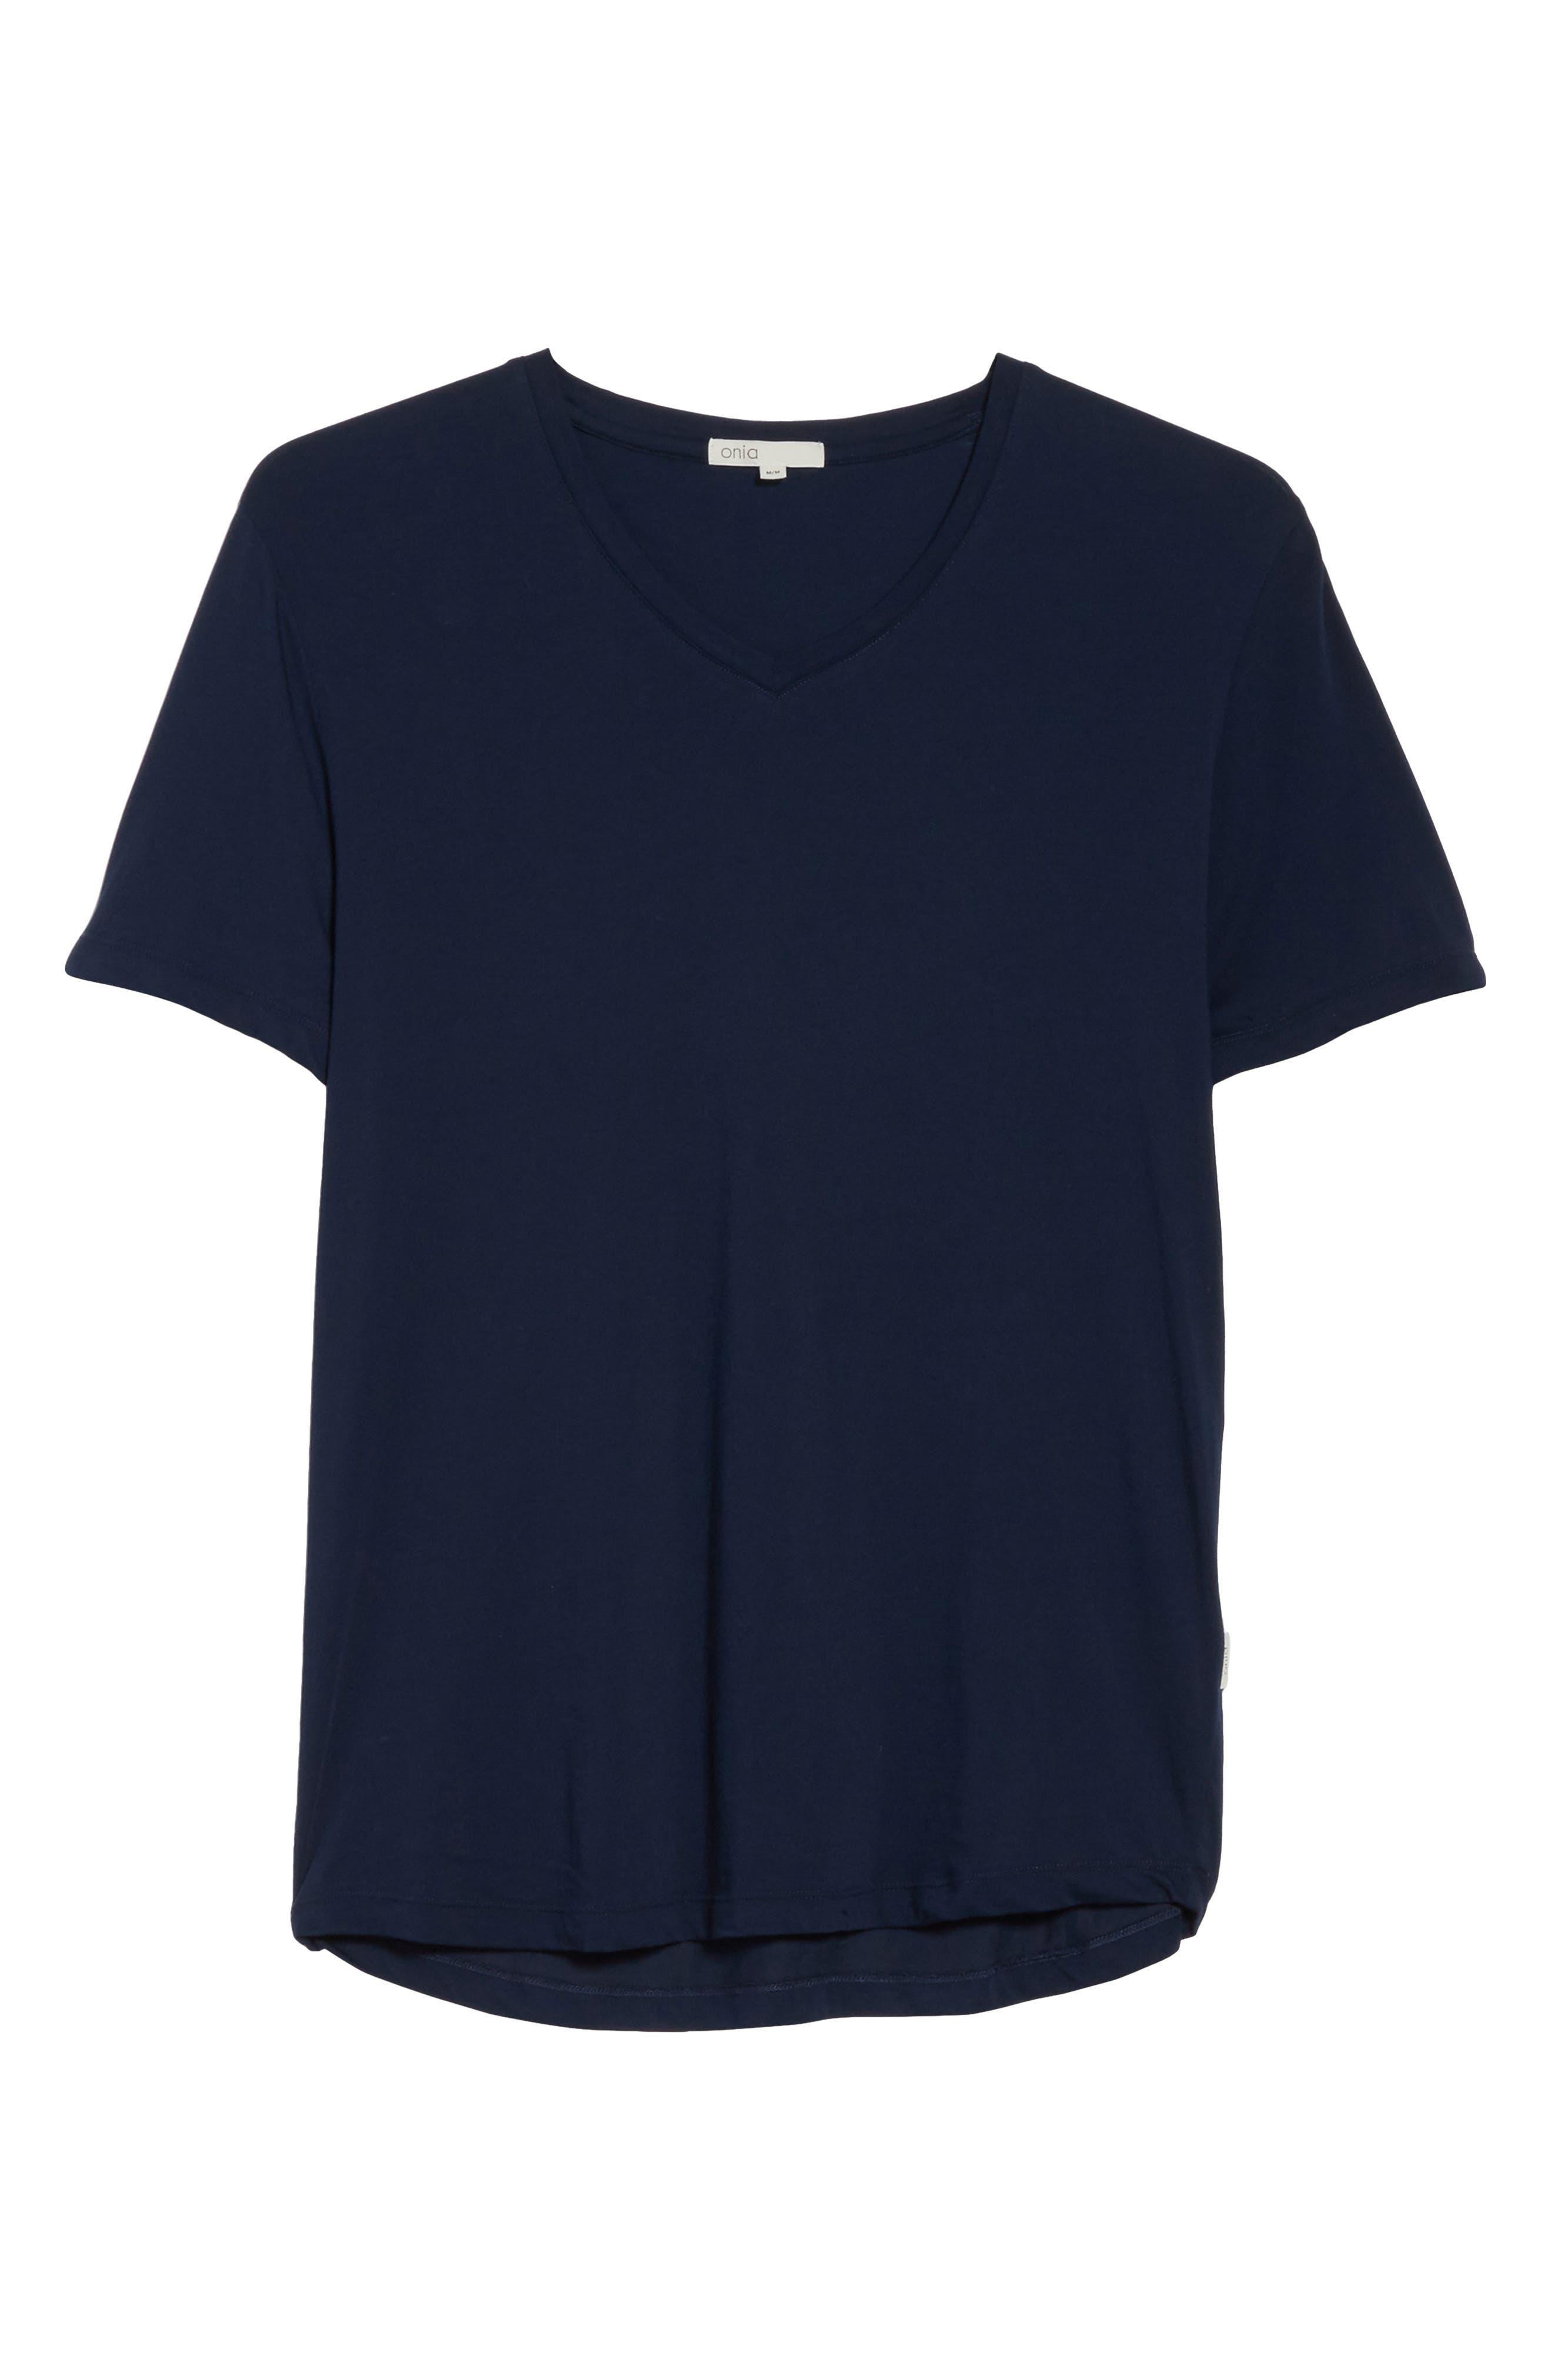 Joey V-Neck T-shirt,                             Alternate thumbnail 6, color,                             419